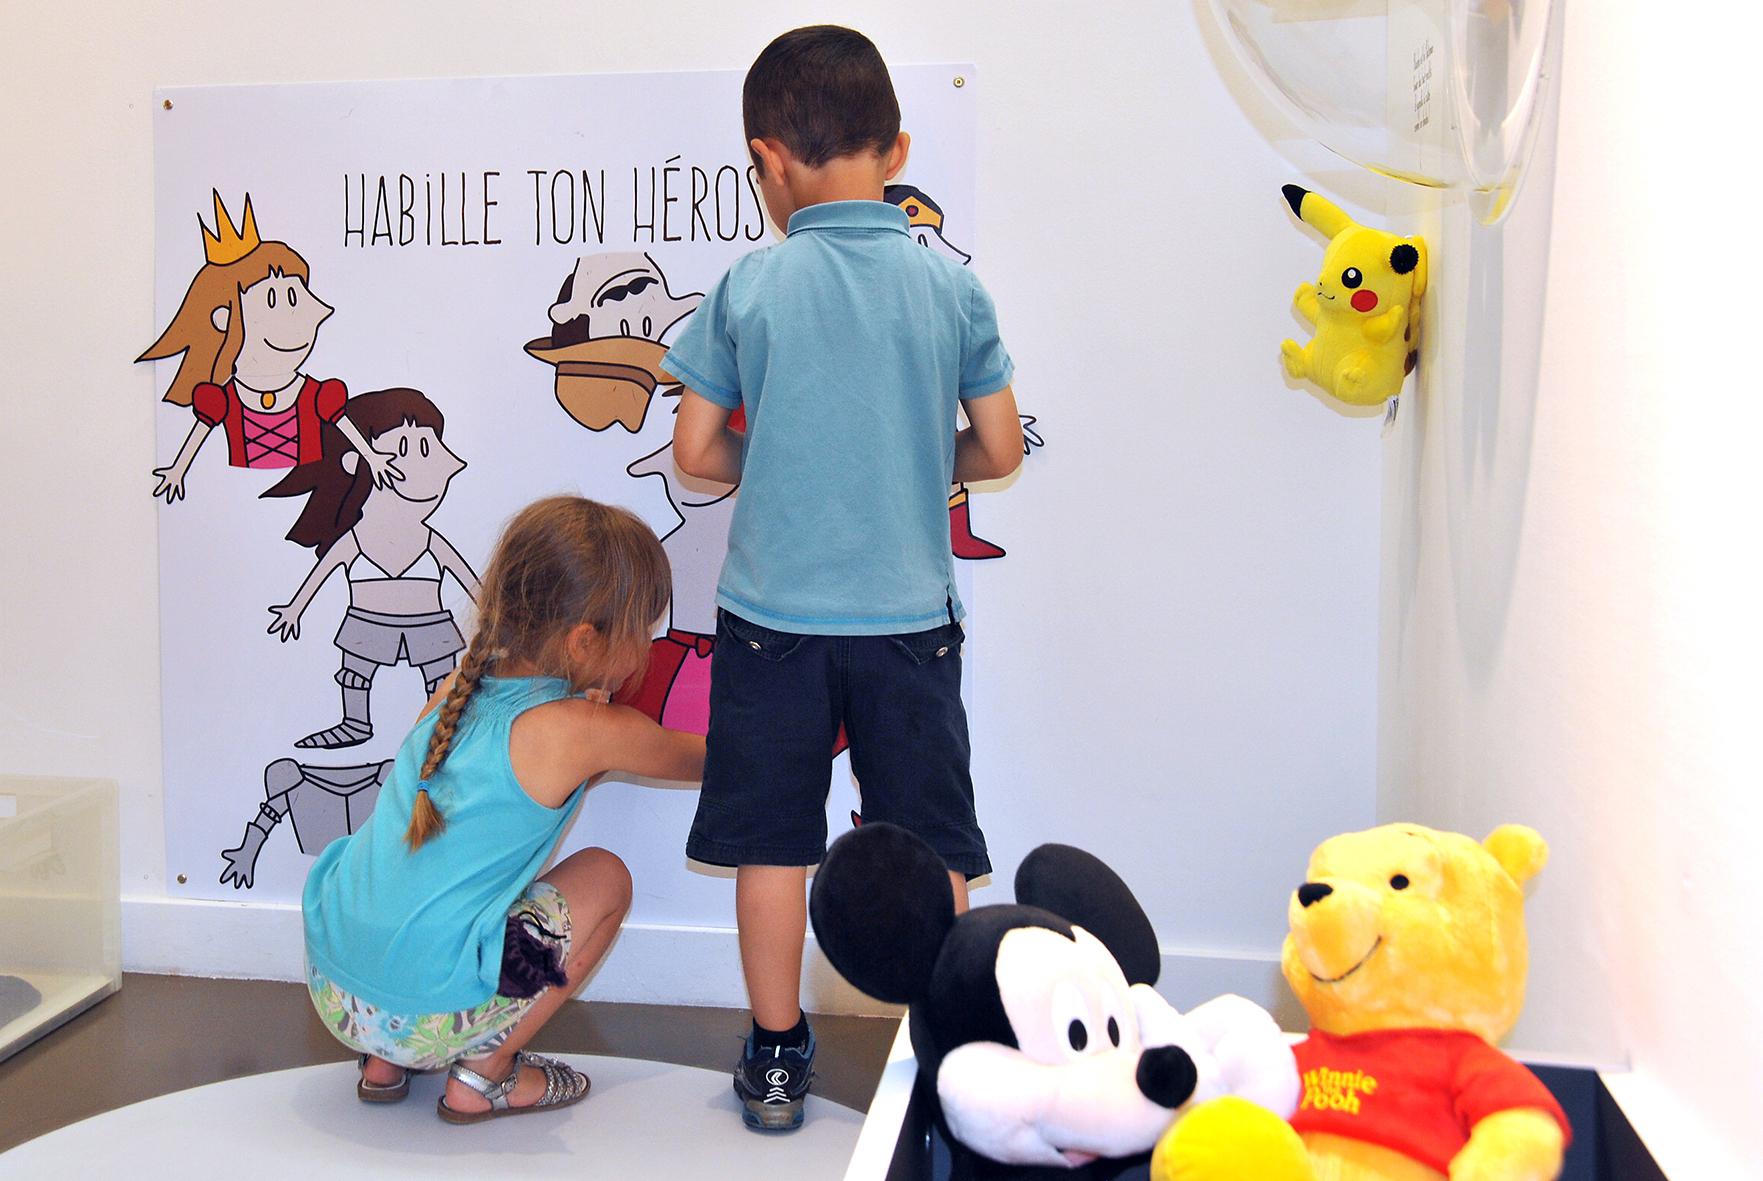 Musée du jouet de Moirans - cdts Musée du jouet de Moirans (1)